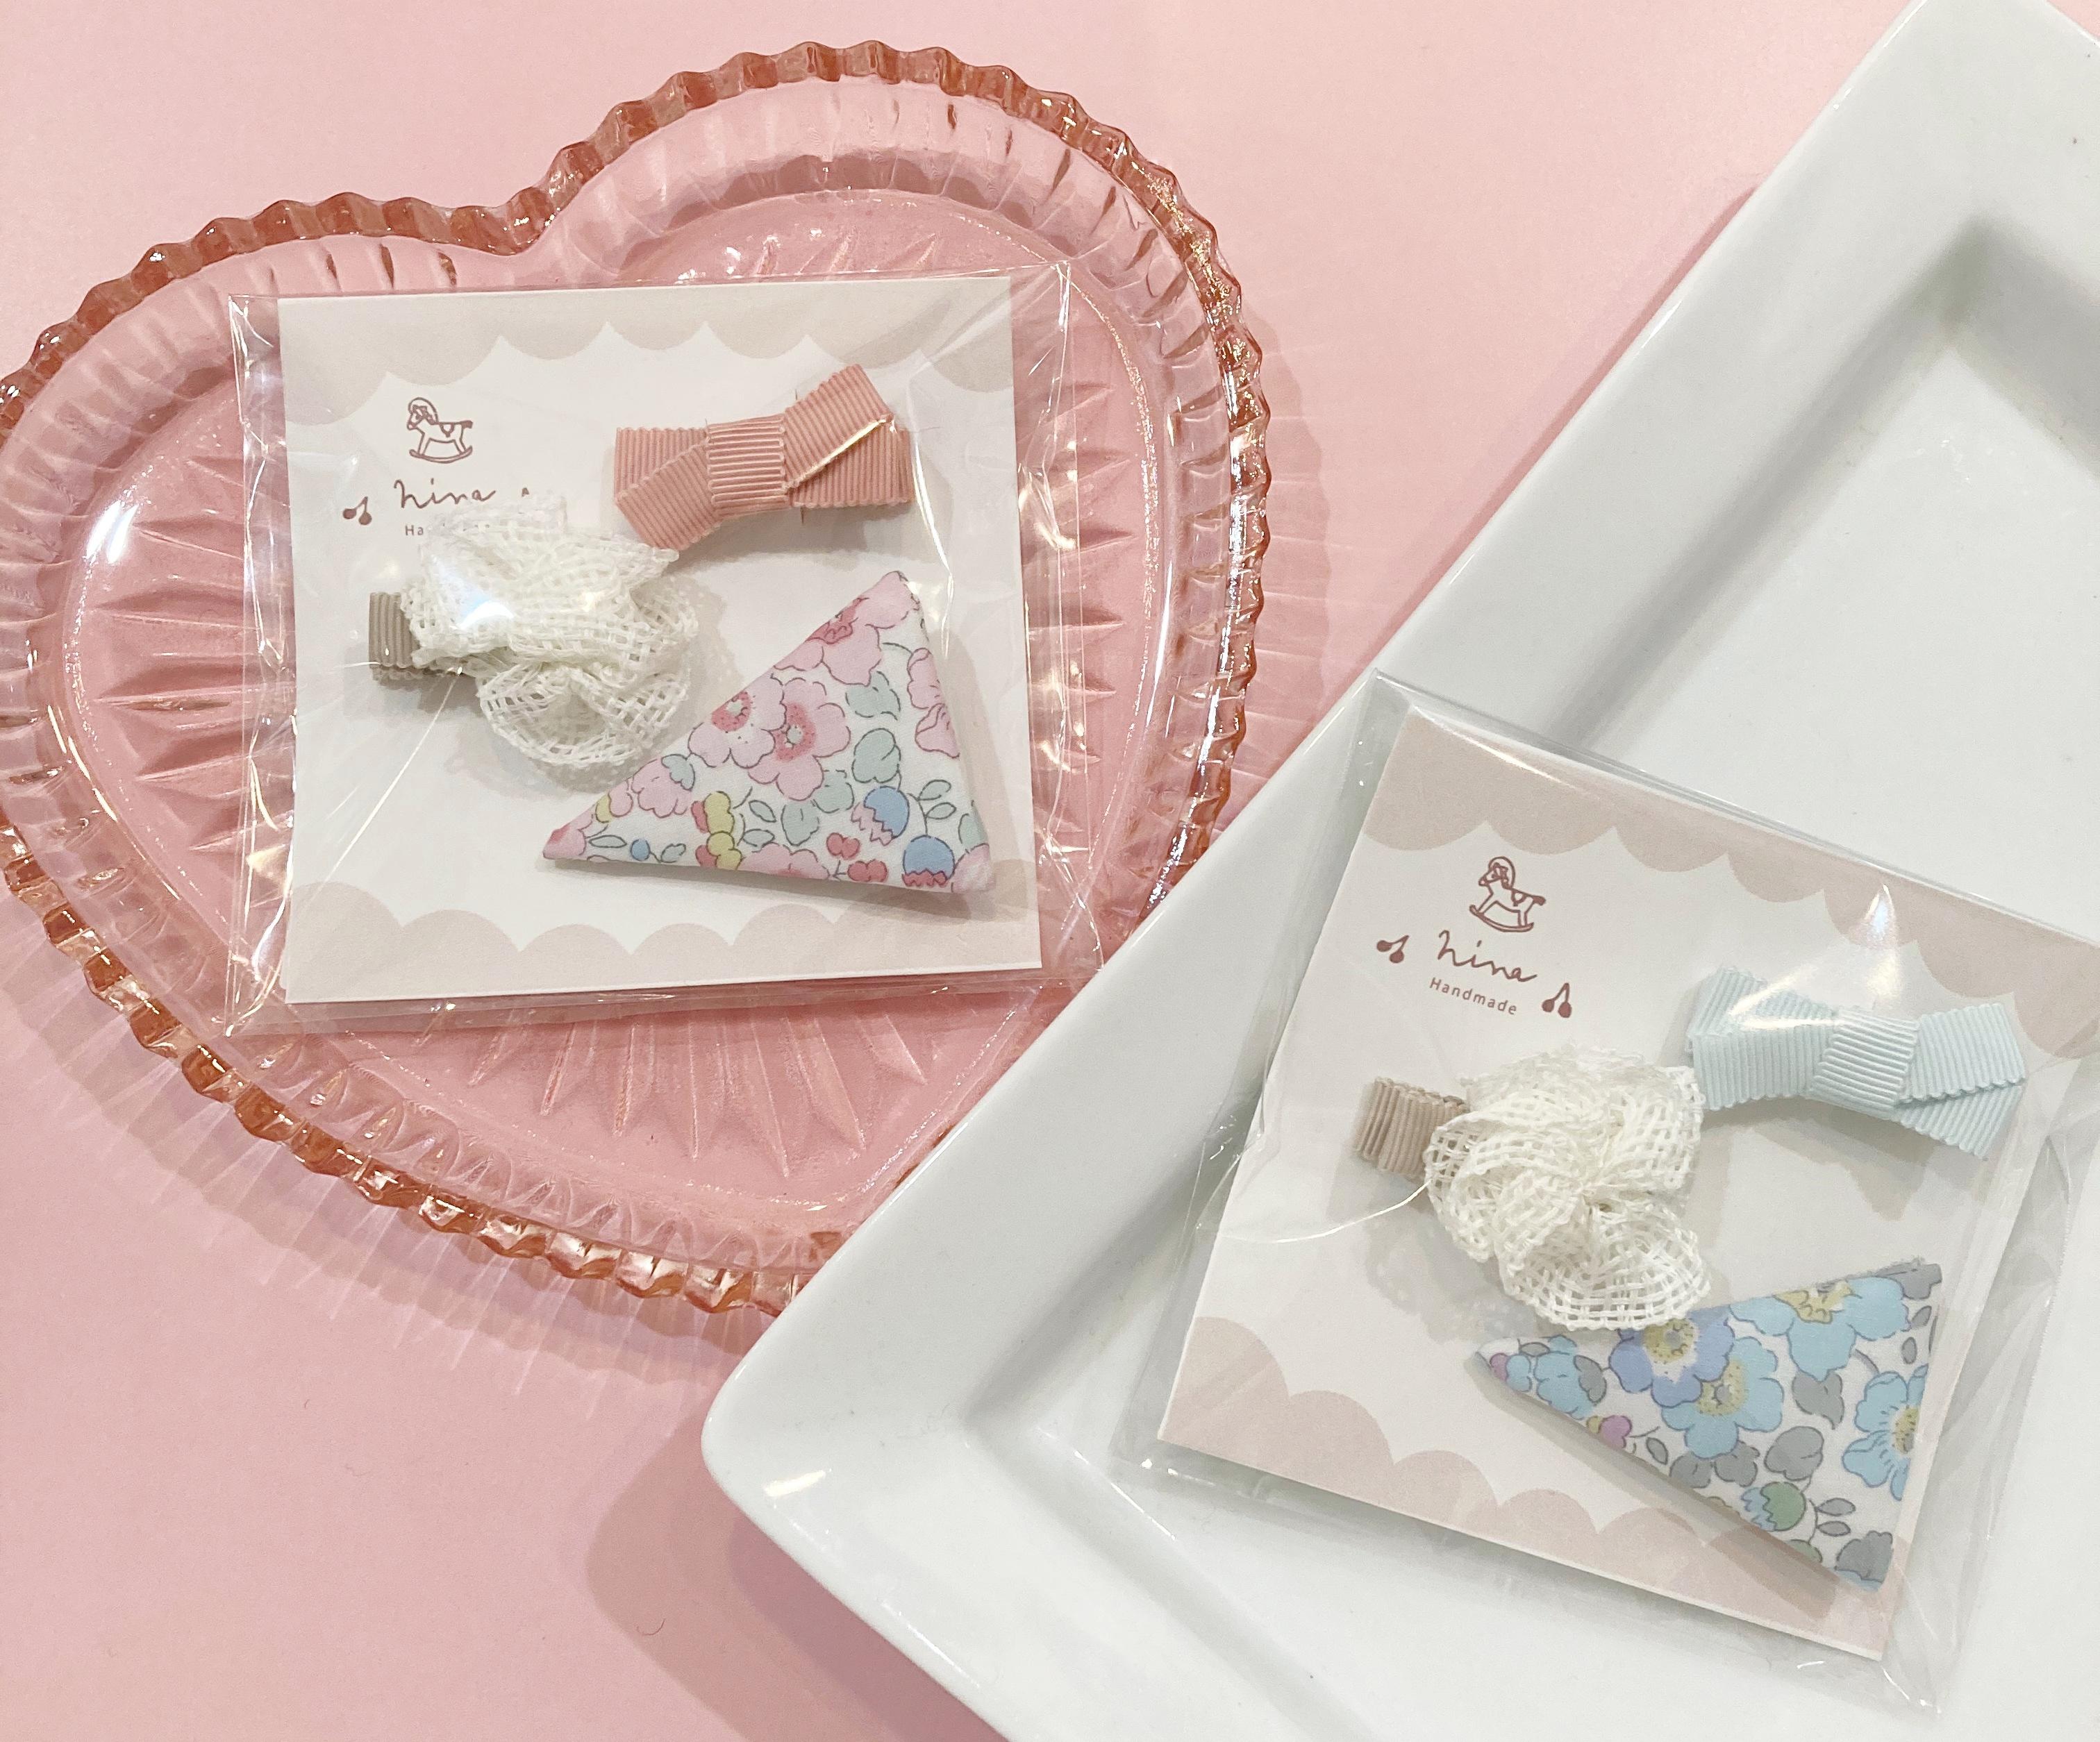 【nina】ヘアクリップ3点set(ピンク、ブルー)